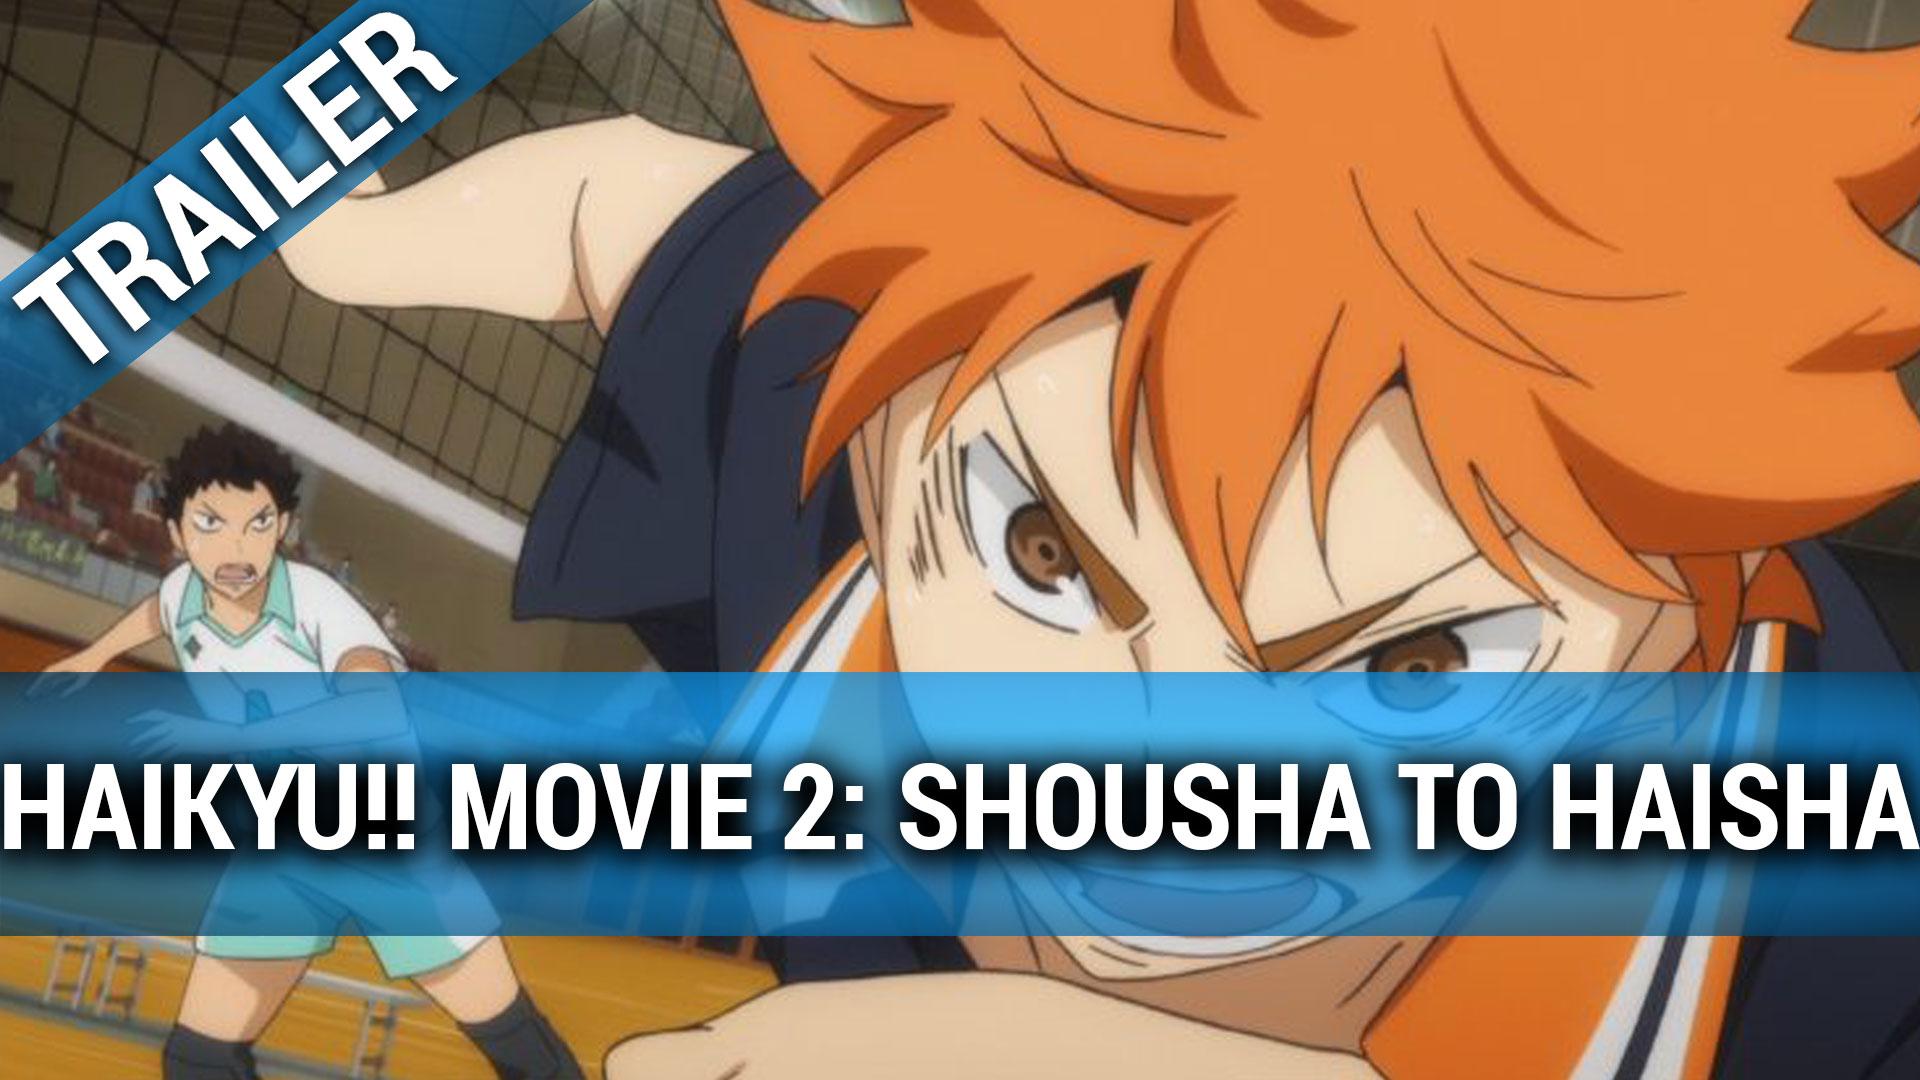 Movie 2 Shousha To Haisha Film 2018 Trailer Kritik KINOde